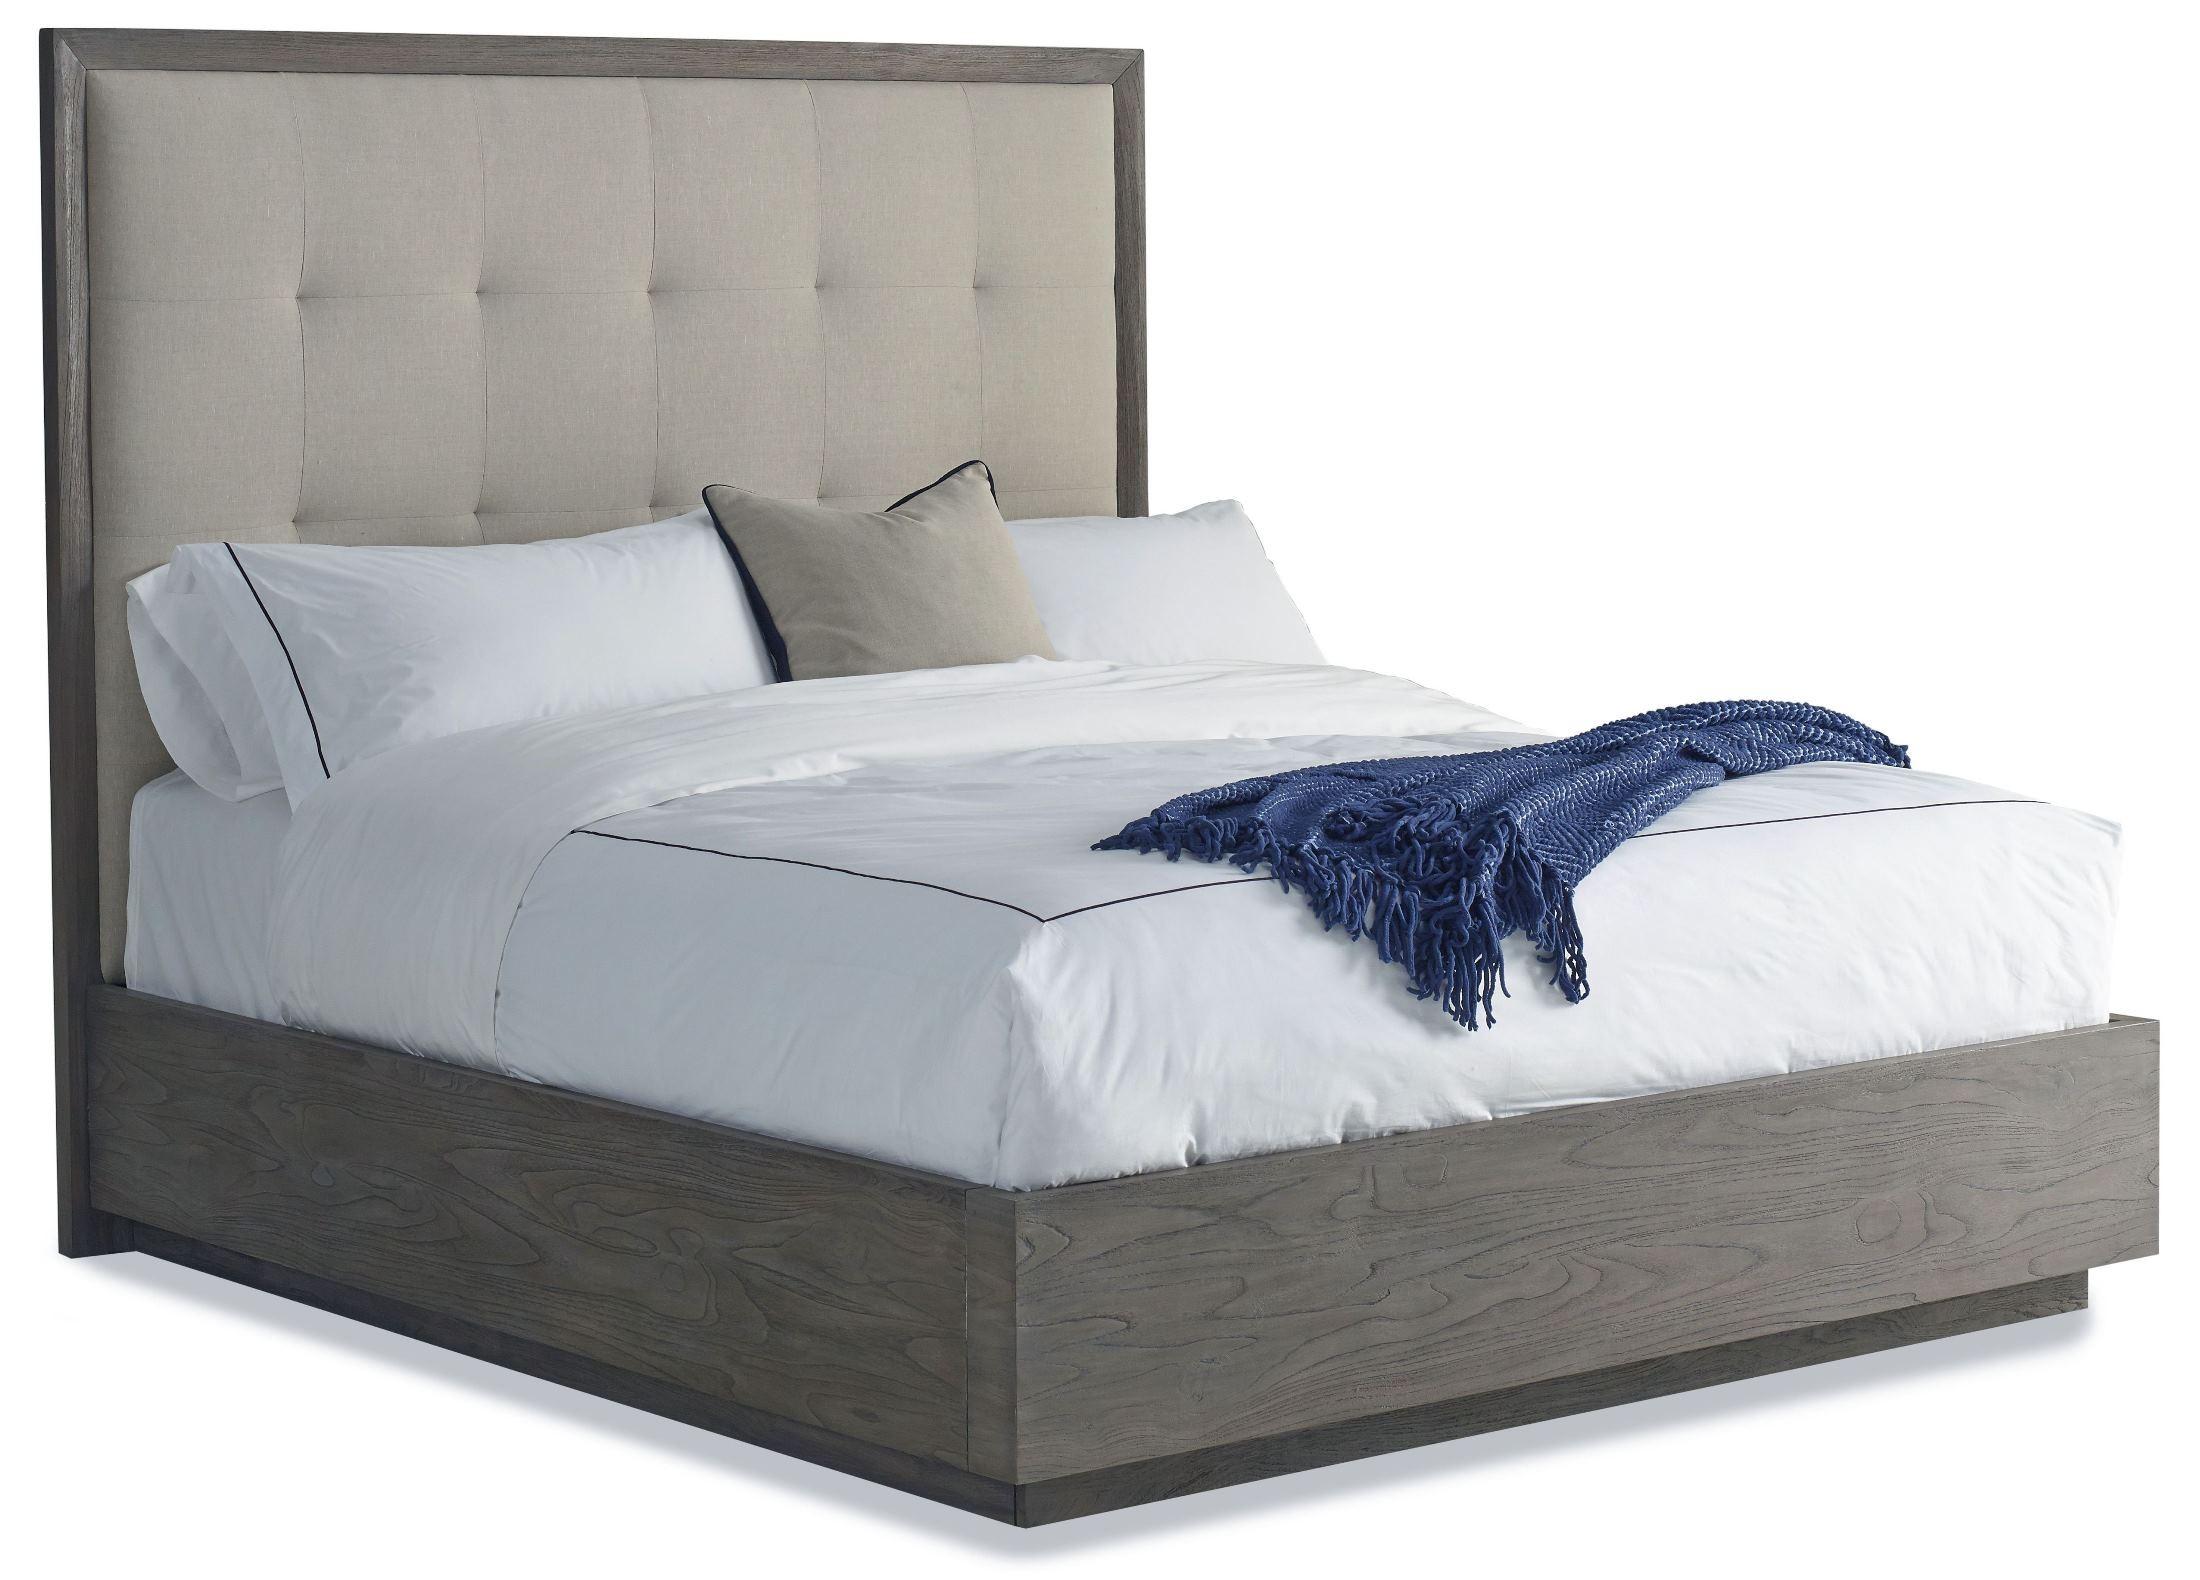 Upholstered Bed Set Queen